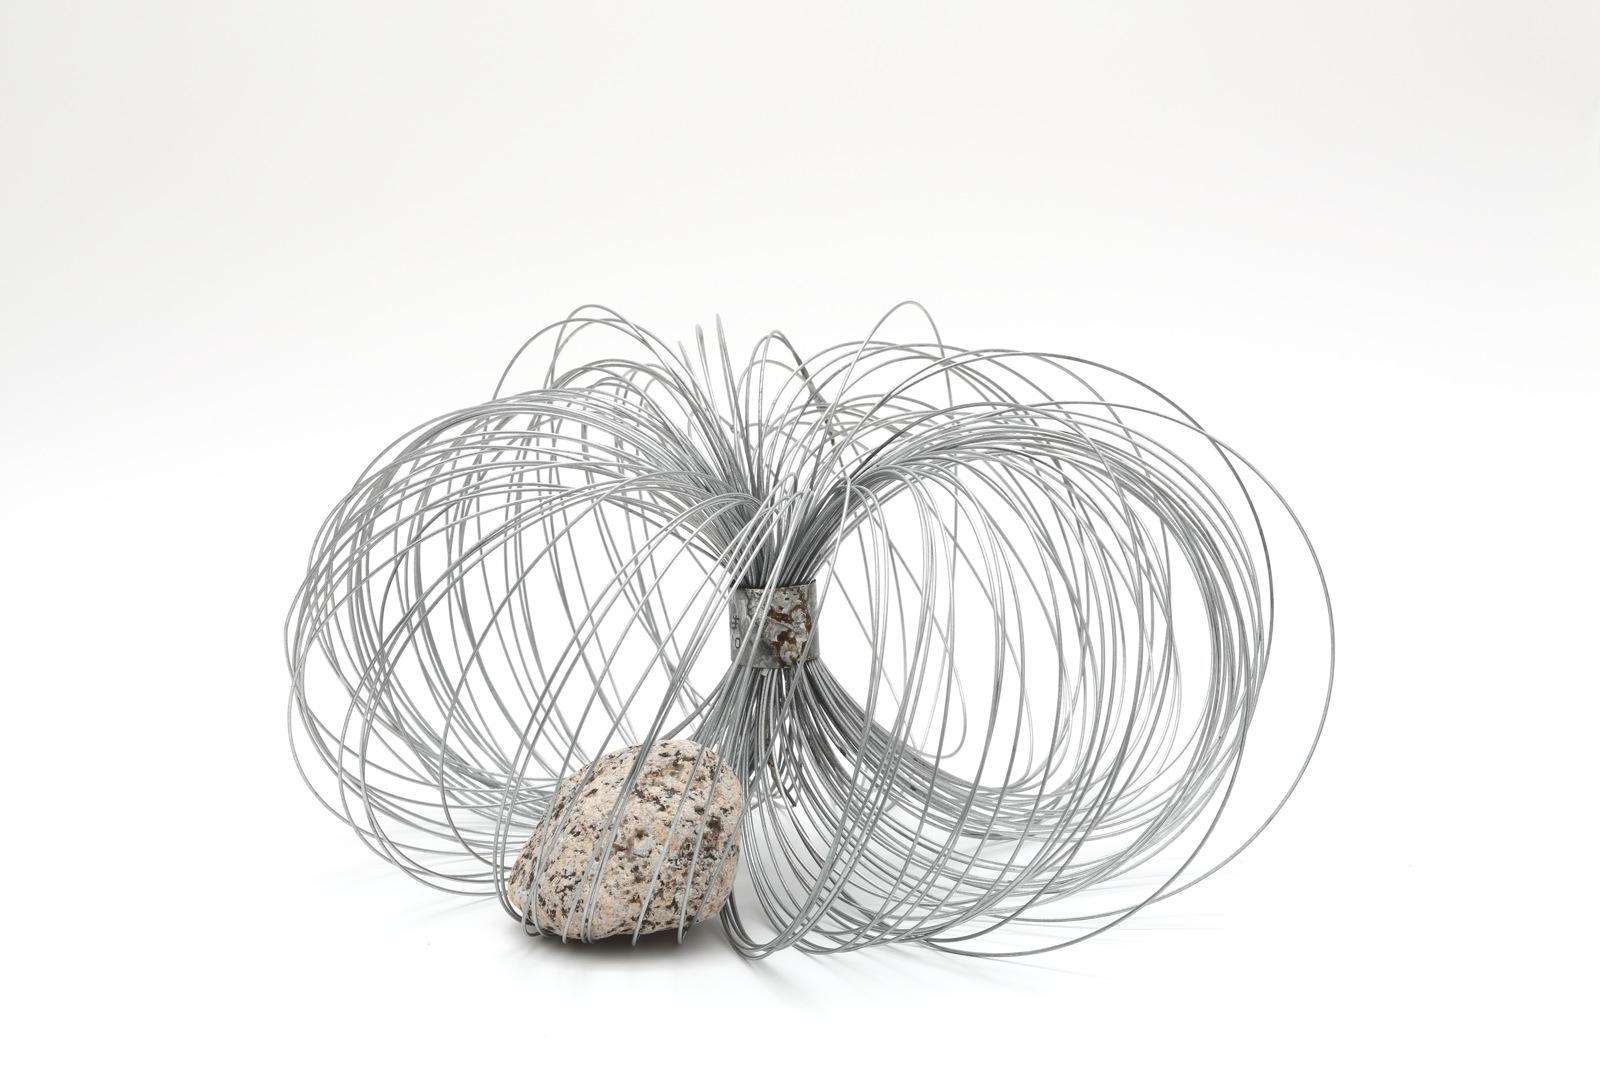 Qualities of Circulating Space , 2010 周界性 ( Shūkaisei ) Metal wire, rock 6 7/8 x 13 inches diameter  17.5 x 33 centimeters